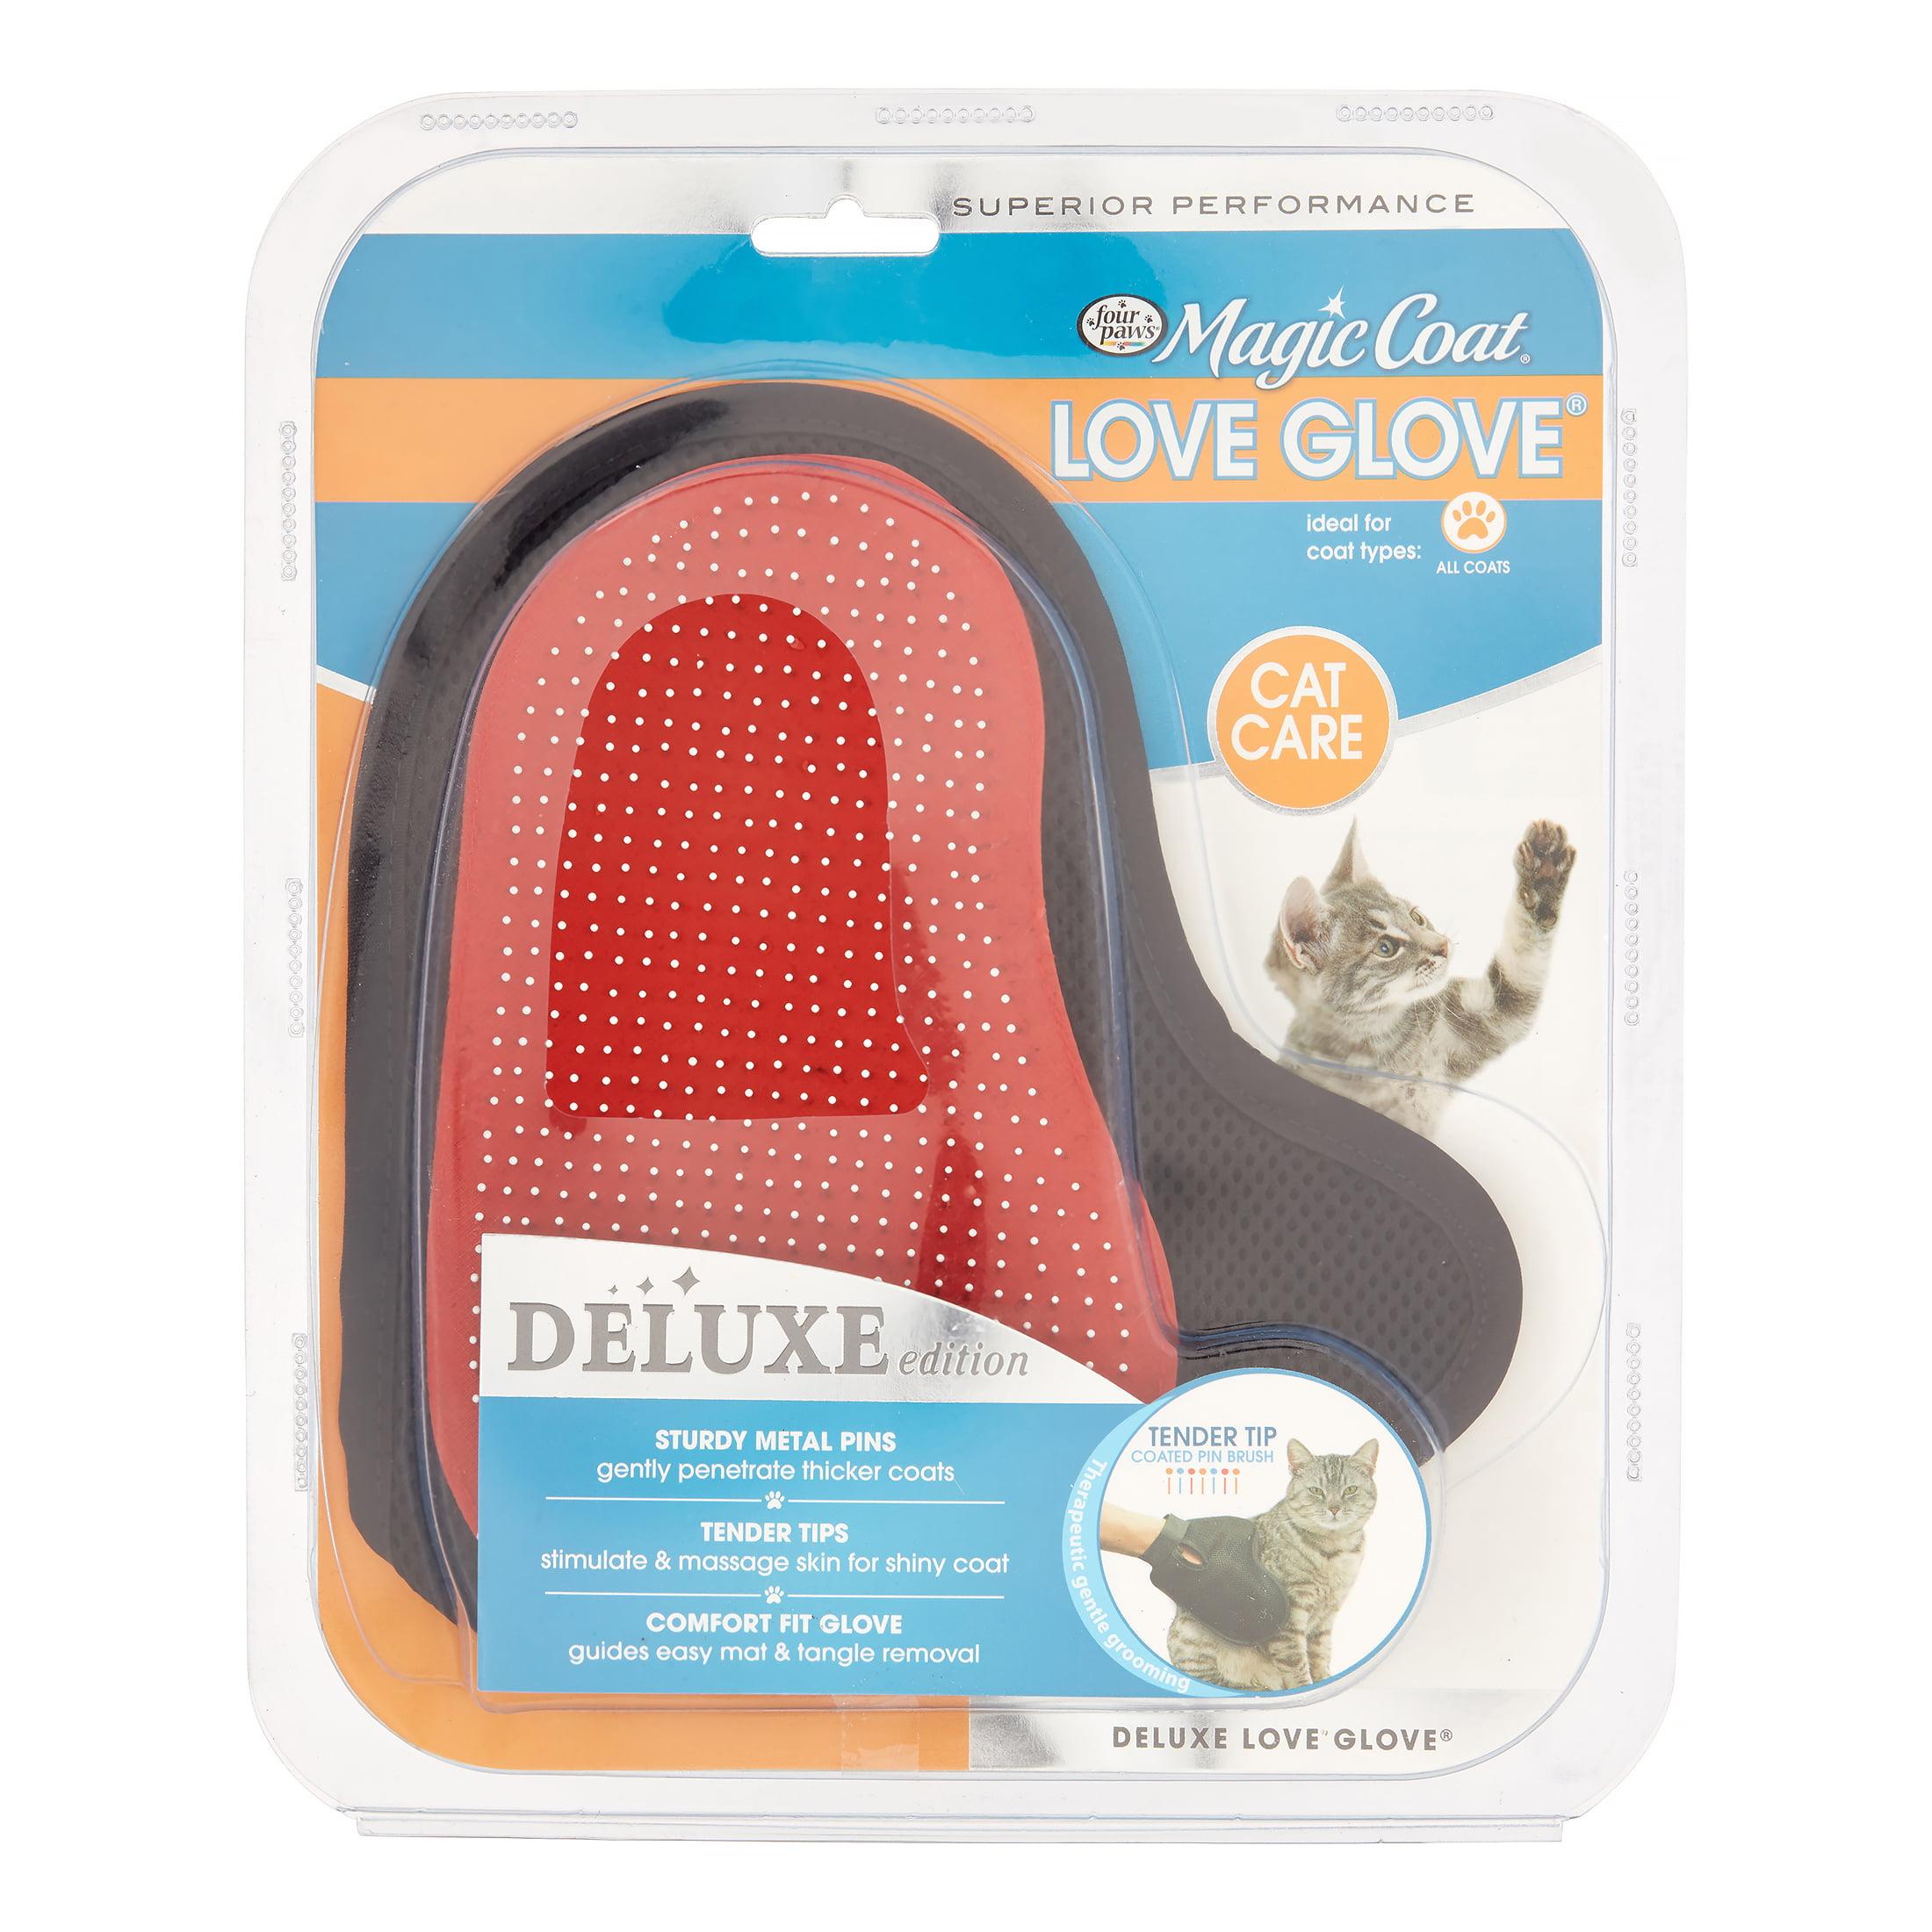 Four Paws Magic Coat Love Glove Cat Grooming Tool, 1 Ct